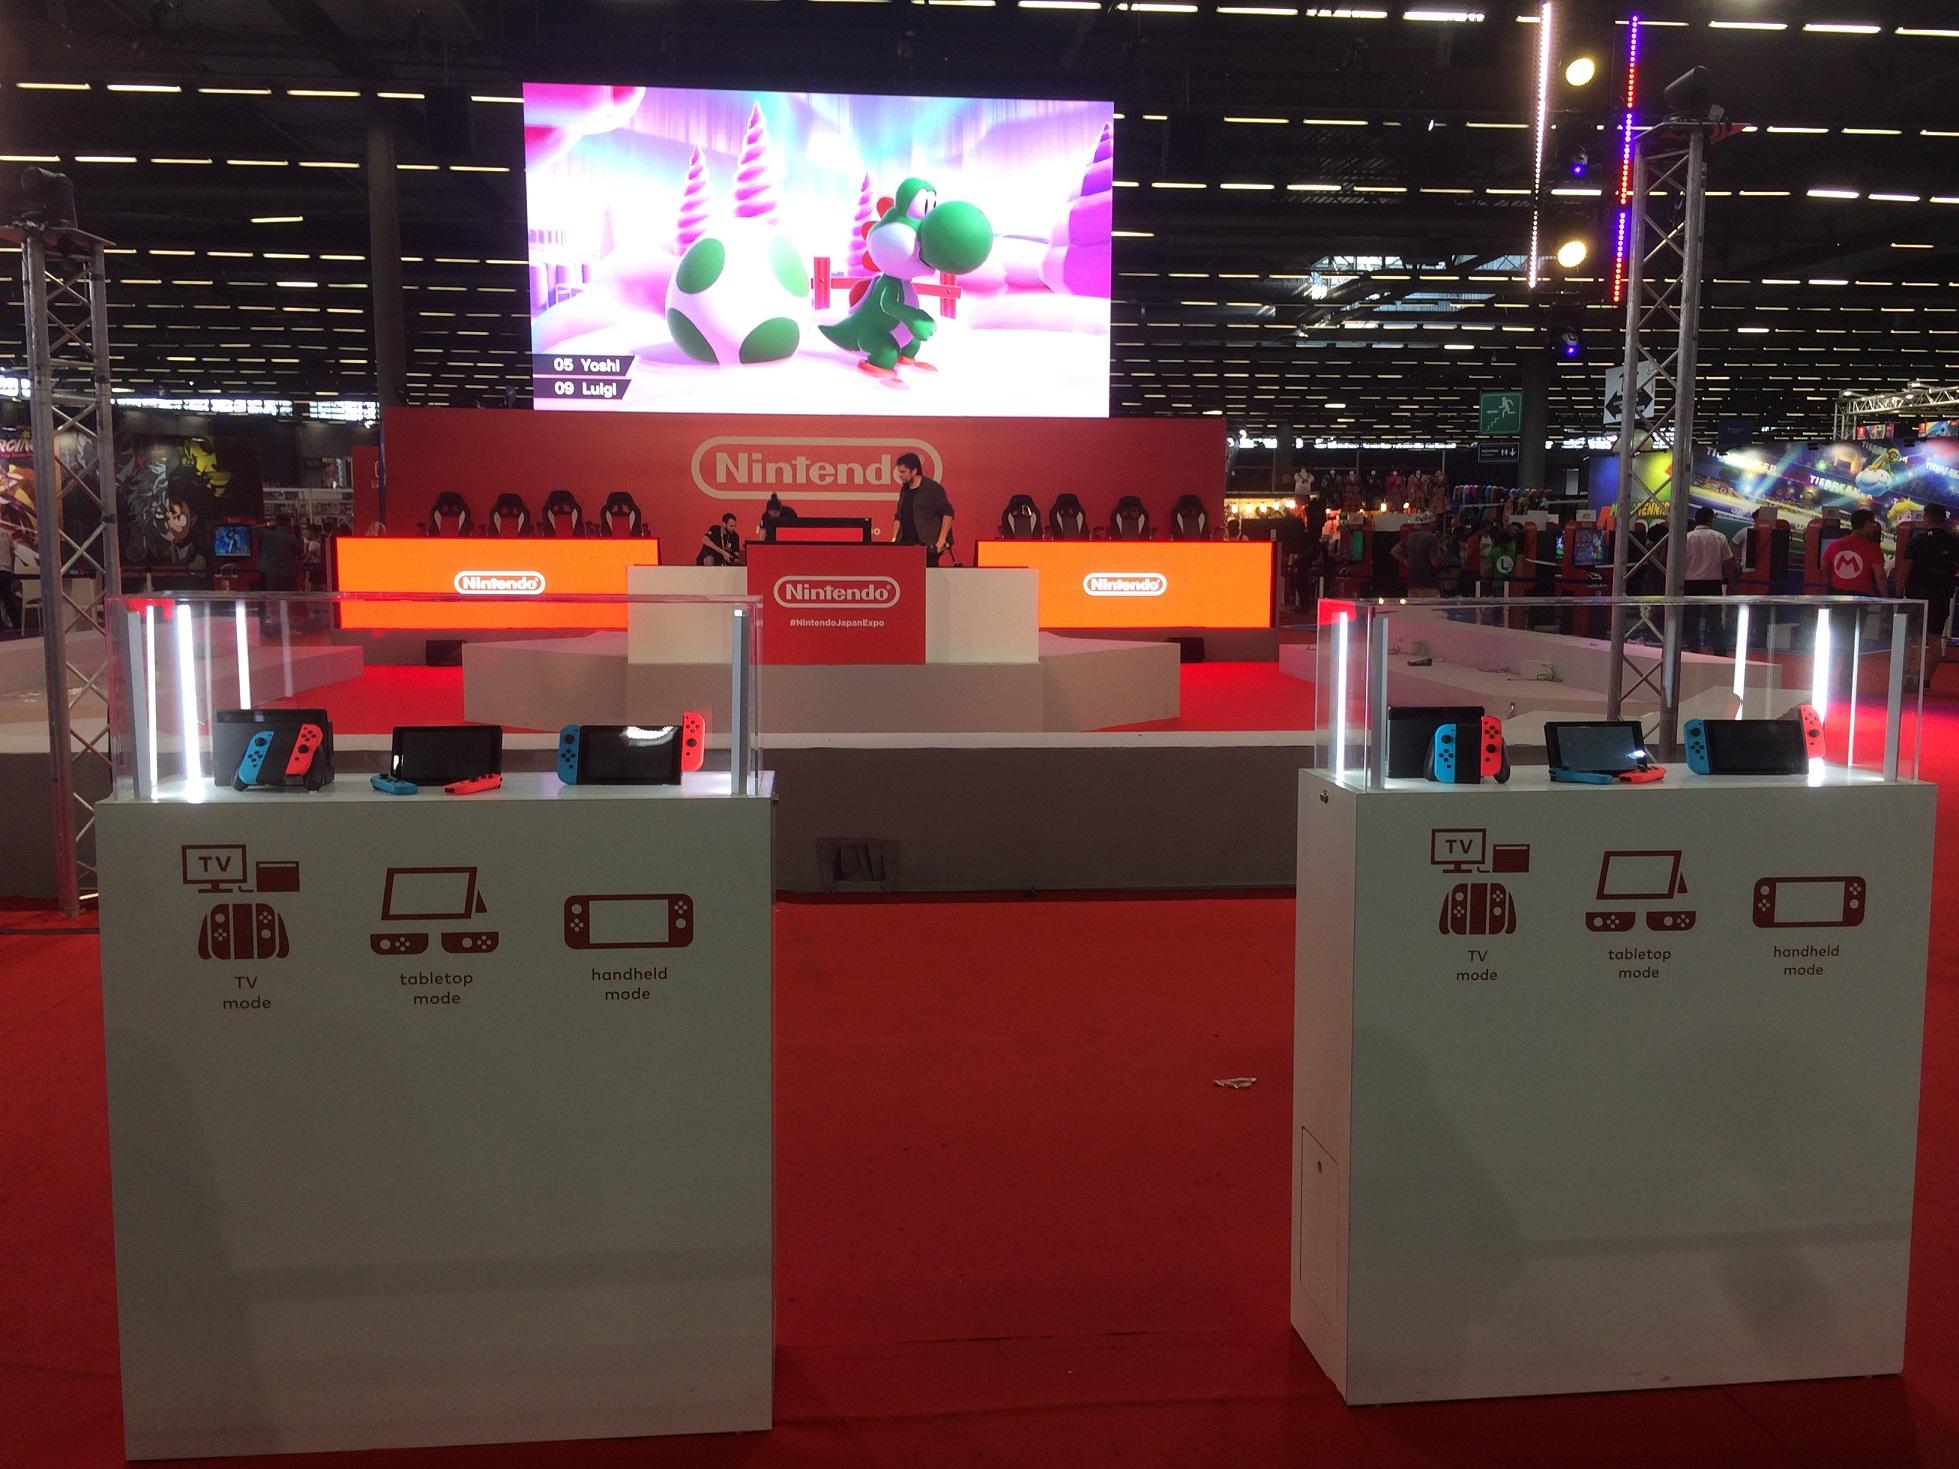 Japan Expo Les Stands : Japan expo 2018 : le stand nintendo smash bros pokémon octopath